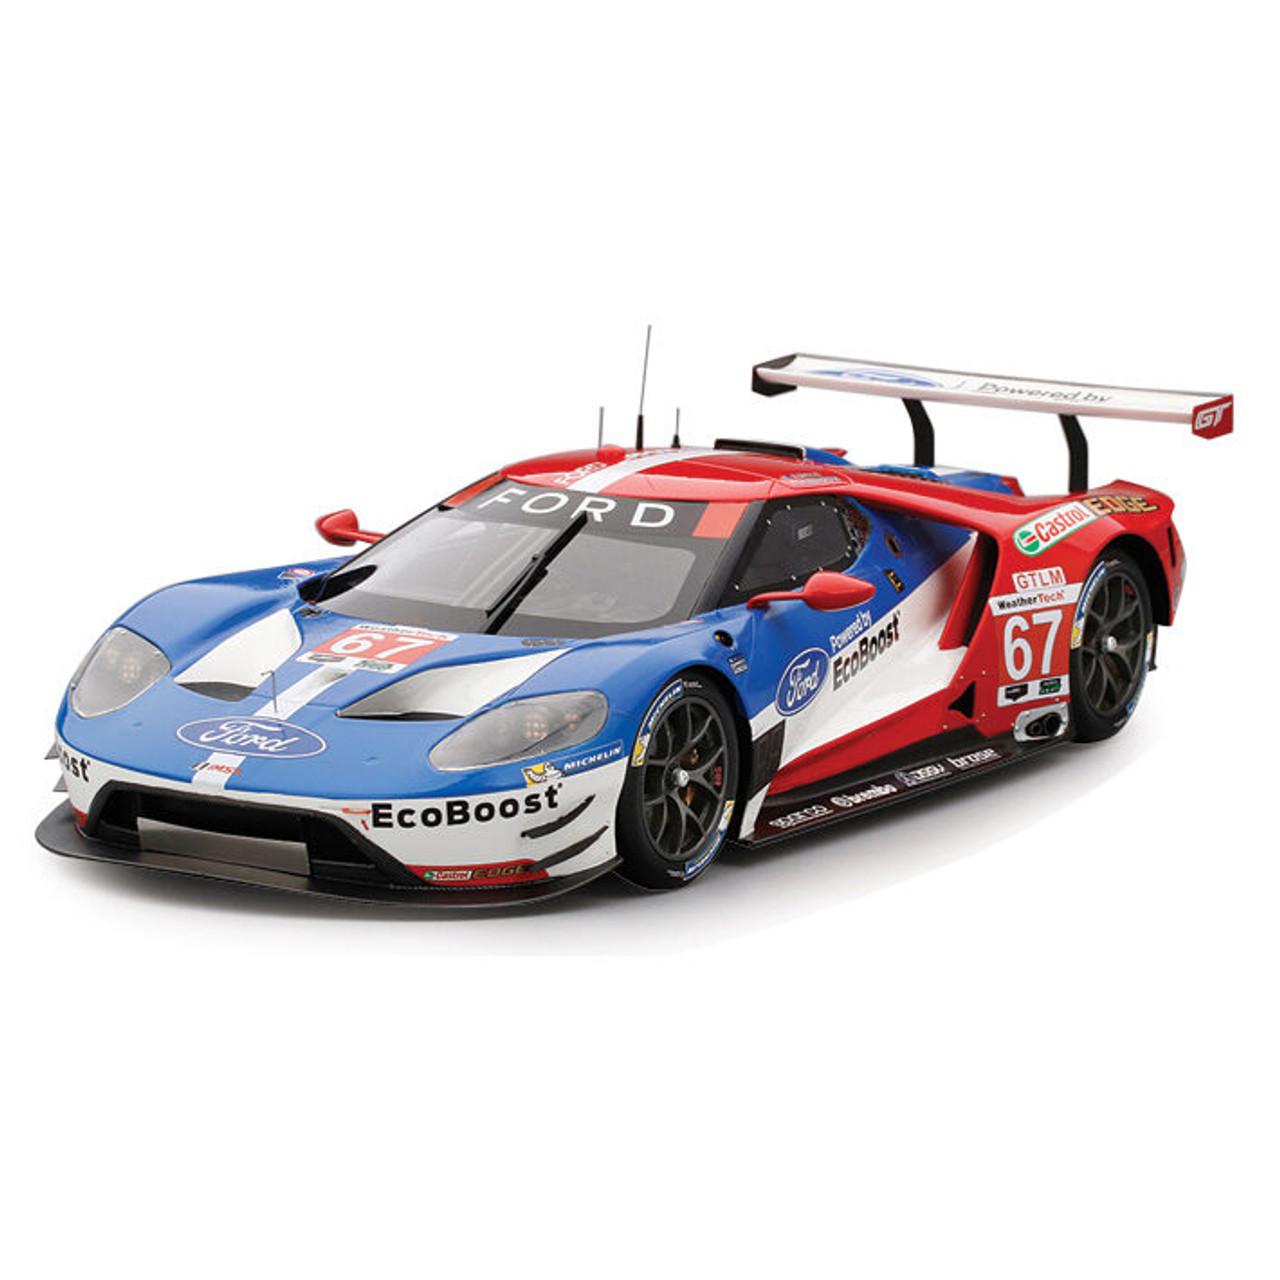 2016 Ford Gt Top Speed >> 2016 Imsa Ford Gt Laguna Seca Grand Prix Winner 1 18 Scale Diecast Model By Top Speed